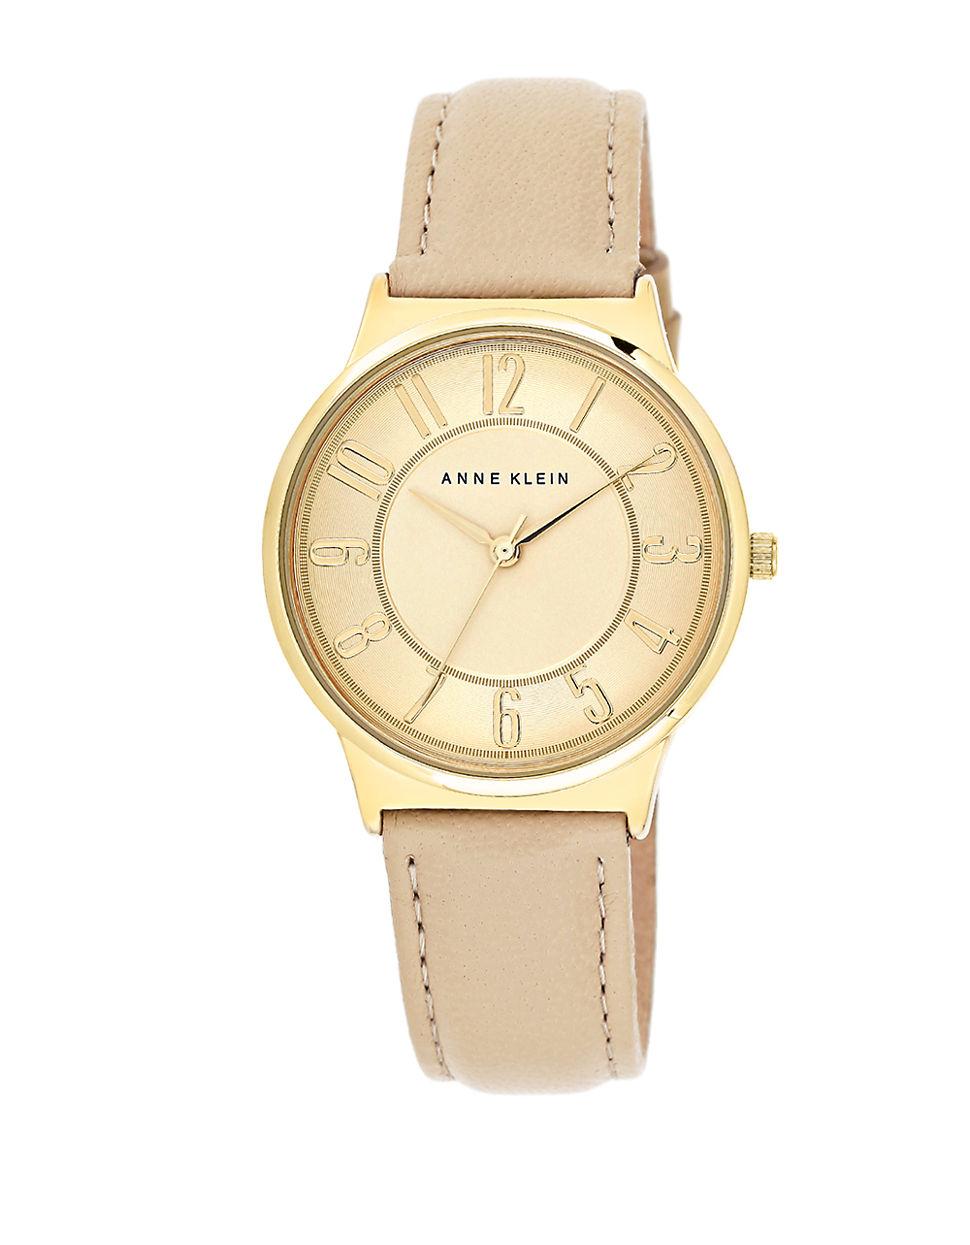 Lyst anne klein goldtone leather strap watch in brown for Anne klein leather strap